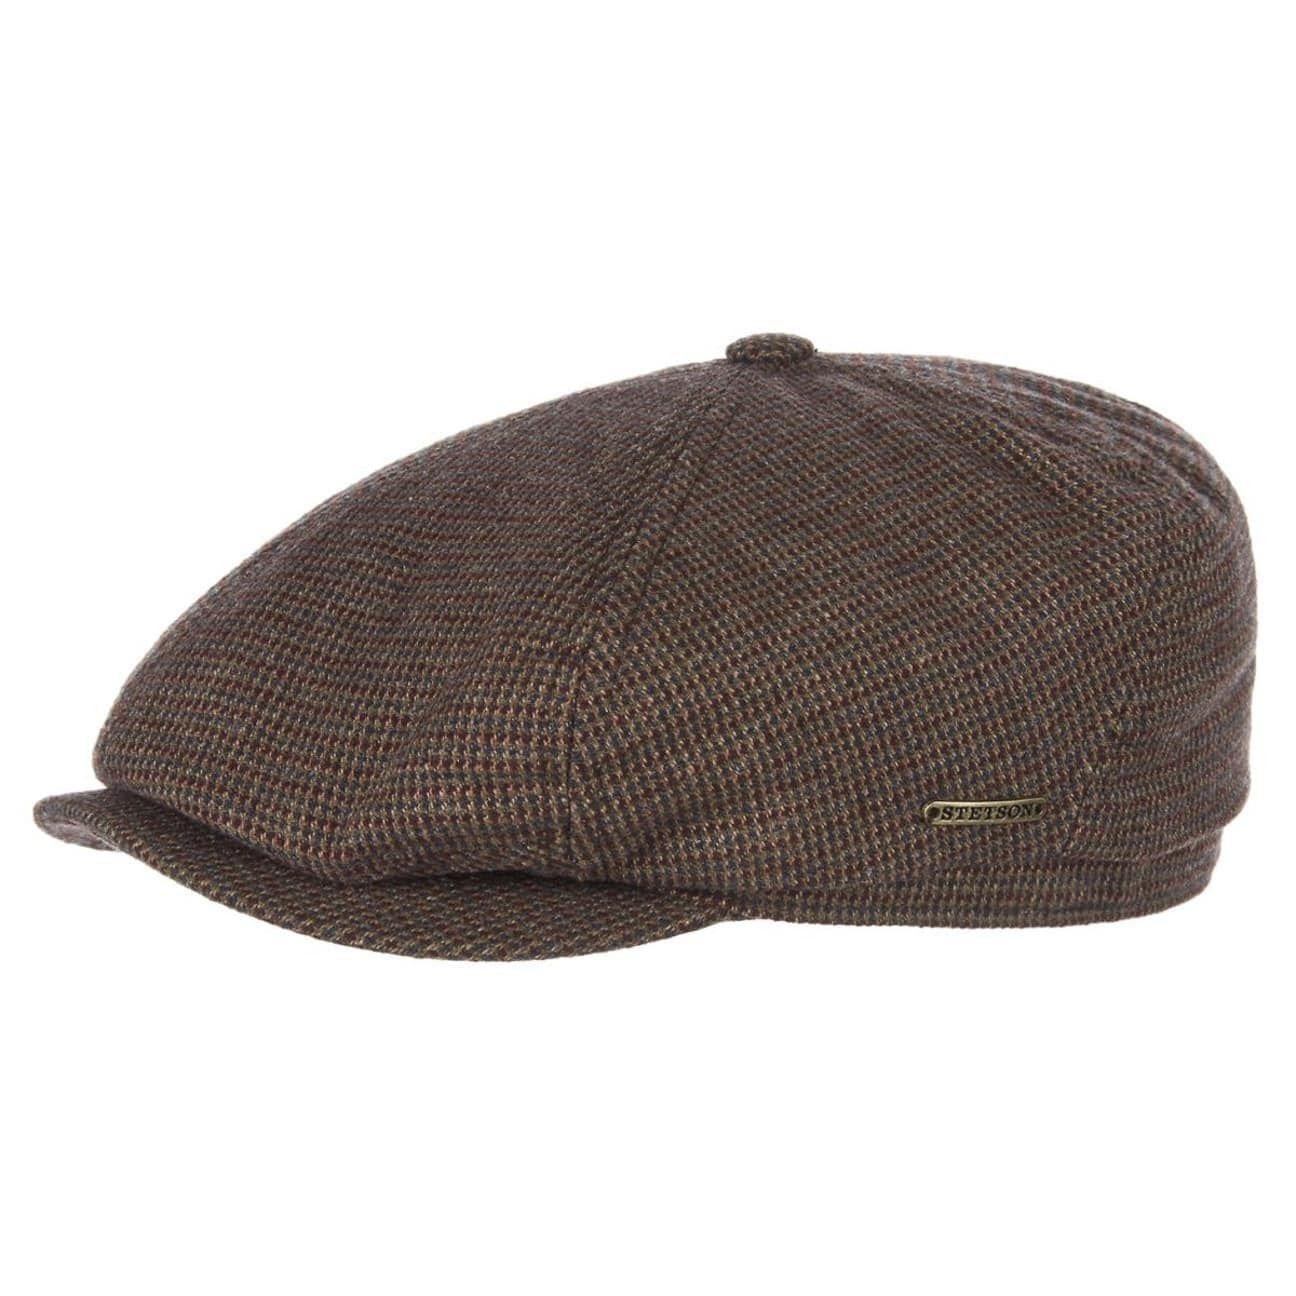 Brooklin Cotton Flat Cap brown